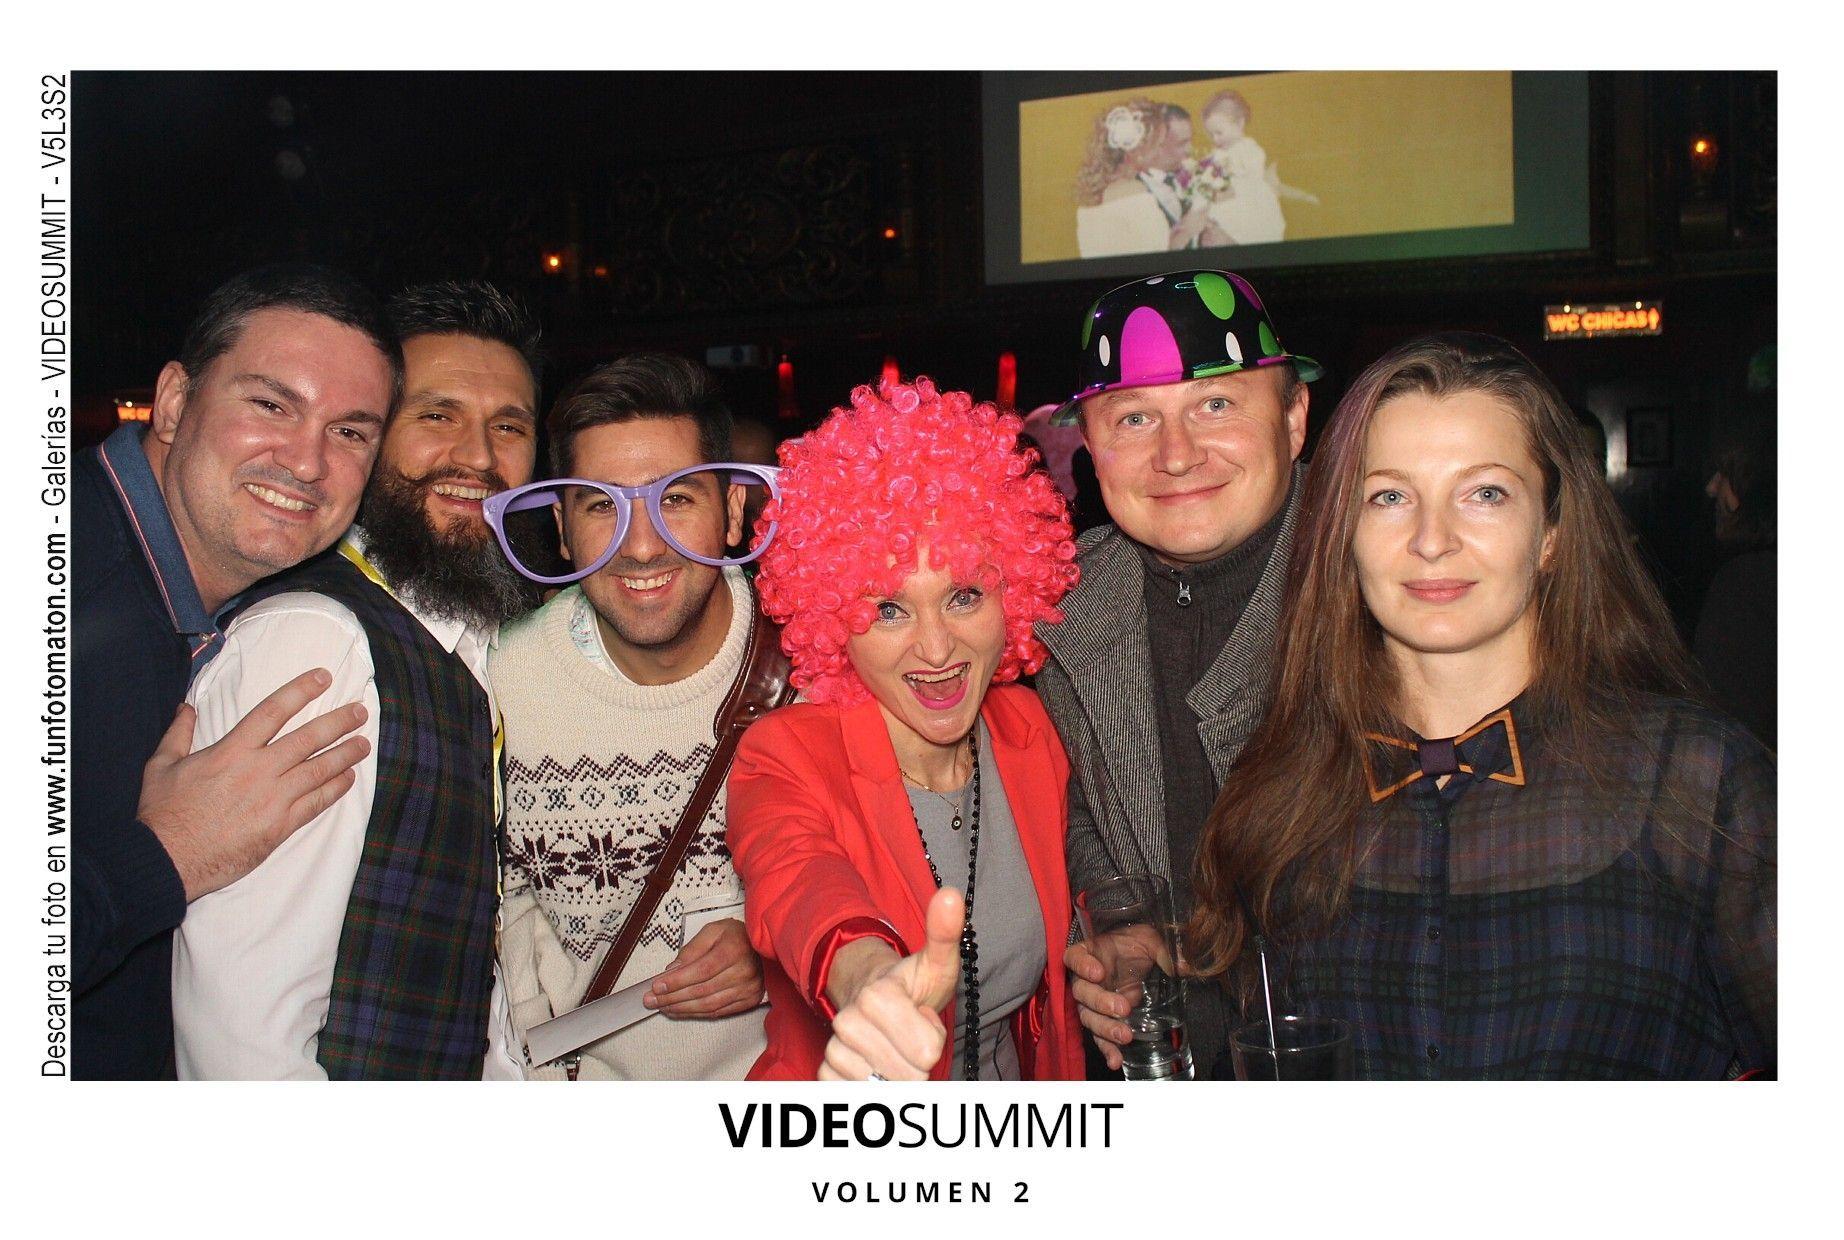 videosummit-vol2-club-party-010